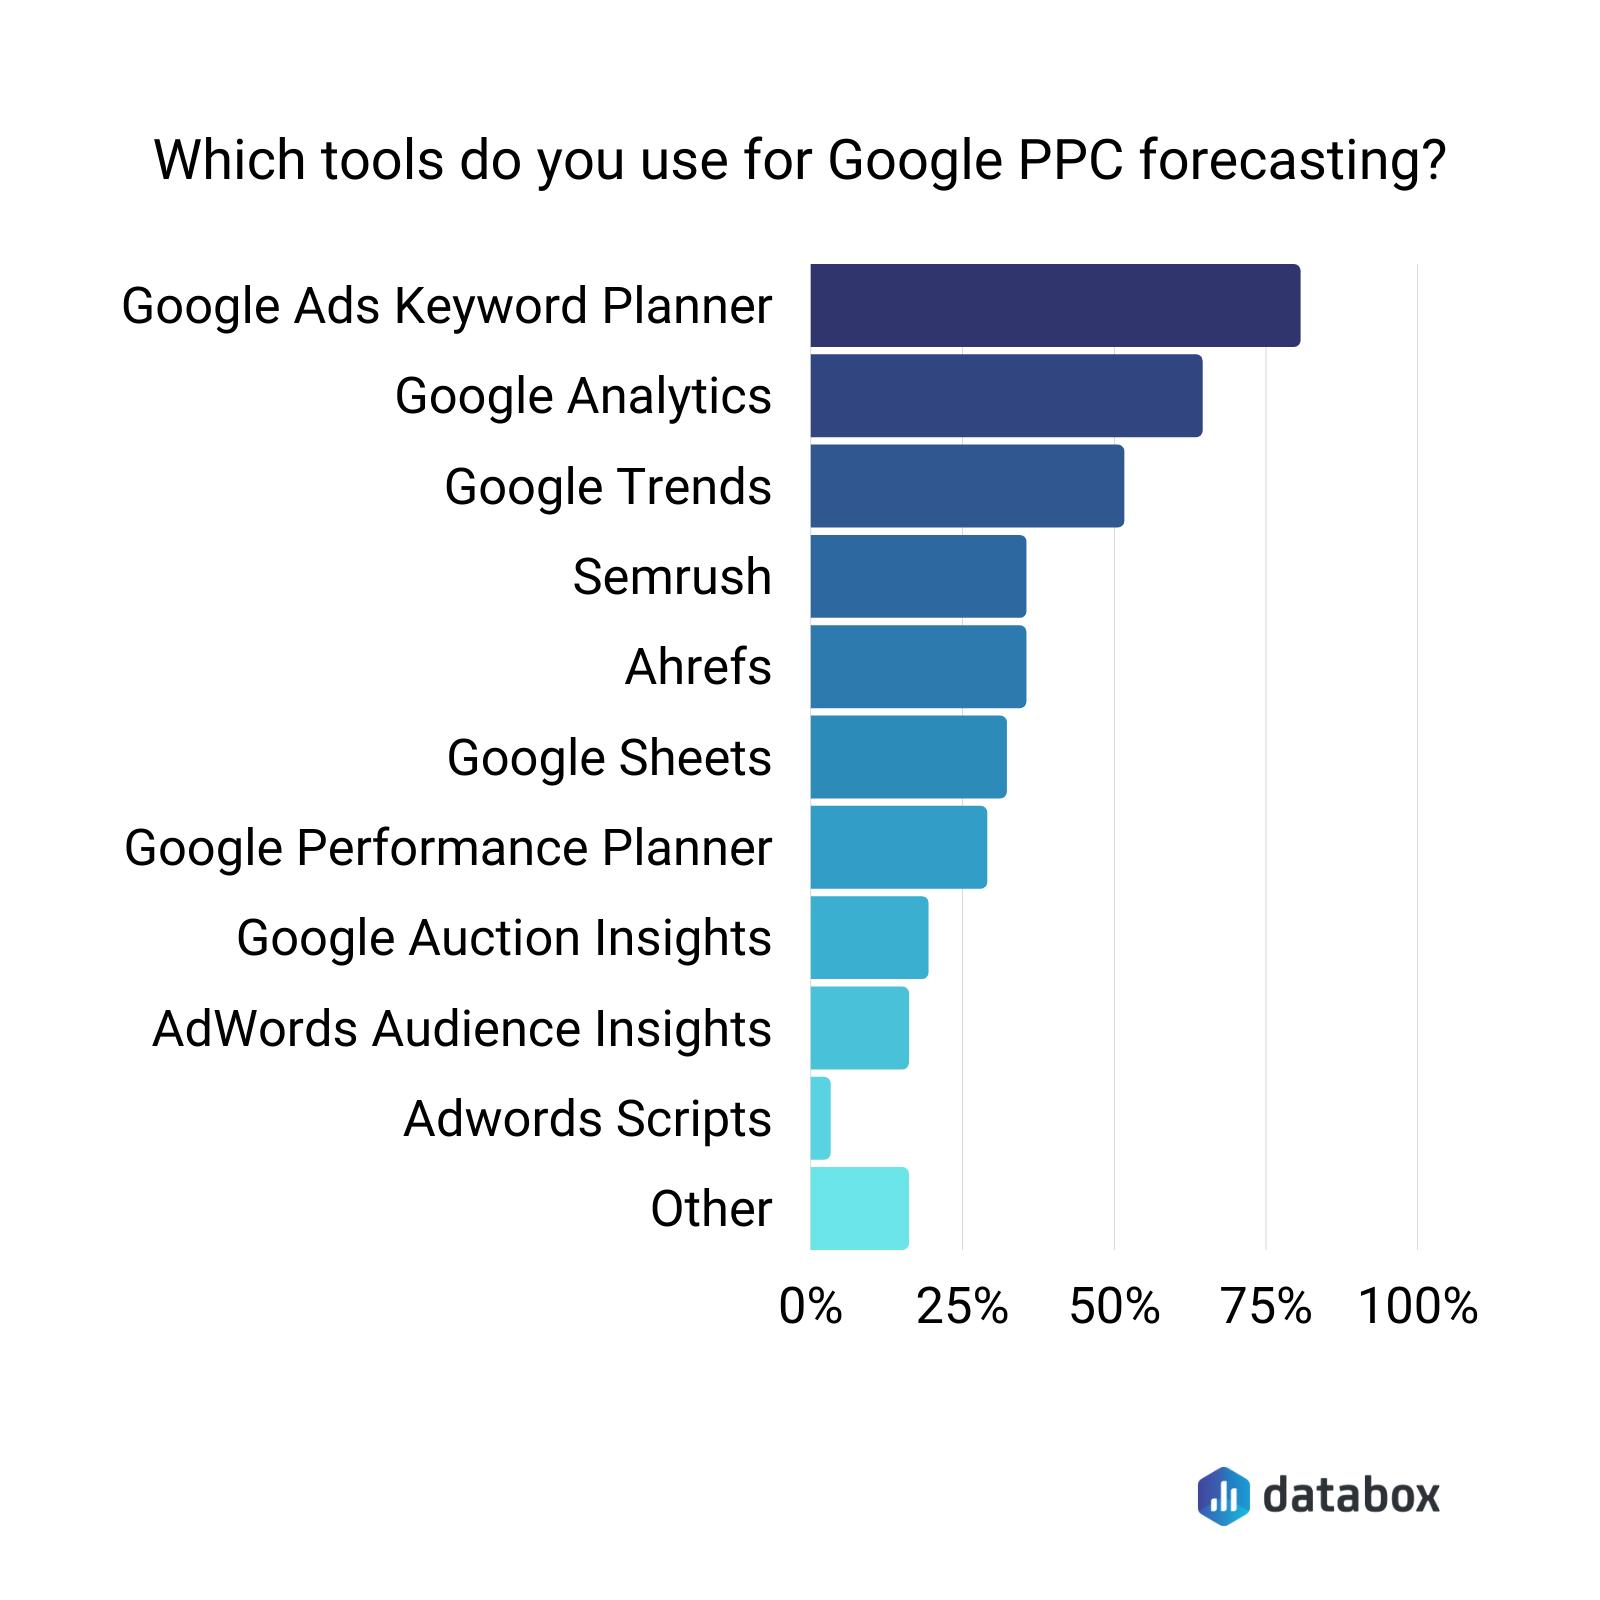 Google PPC forecasting tools